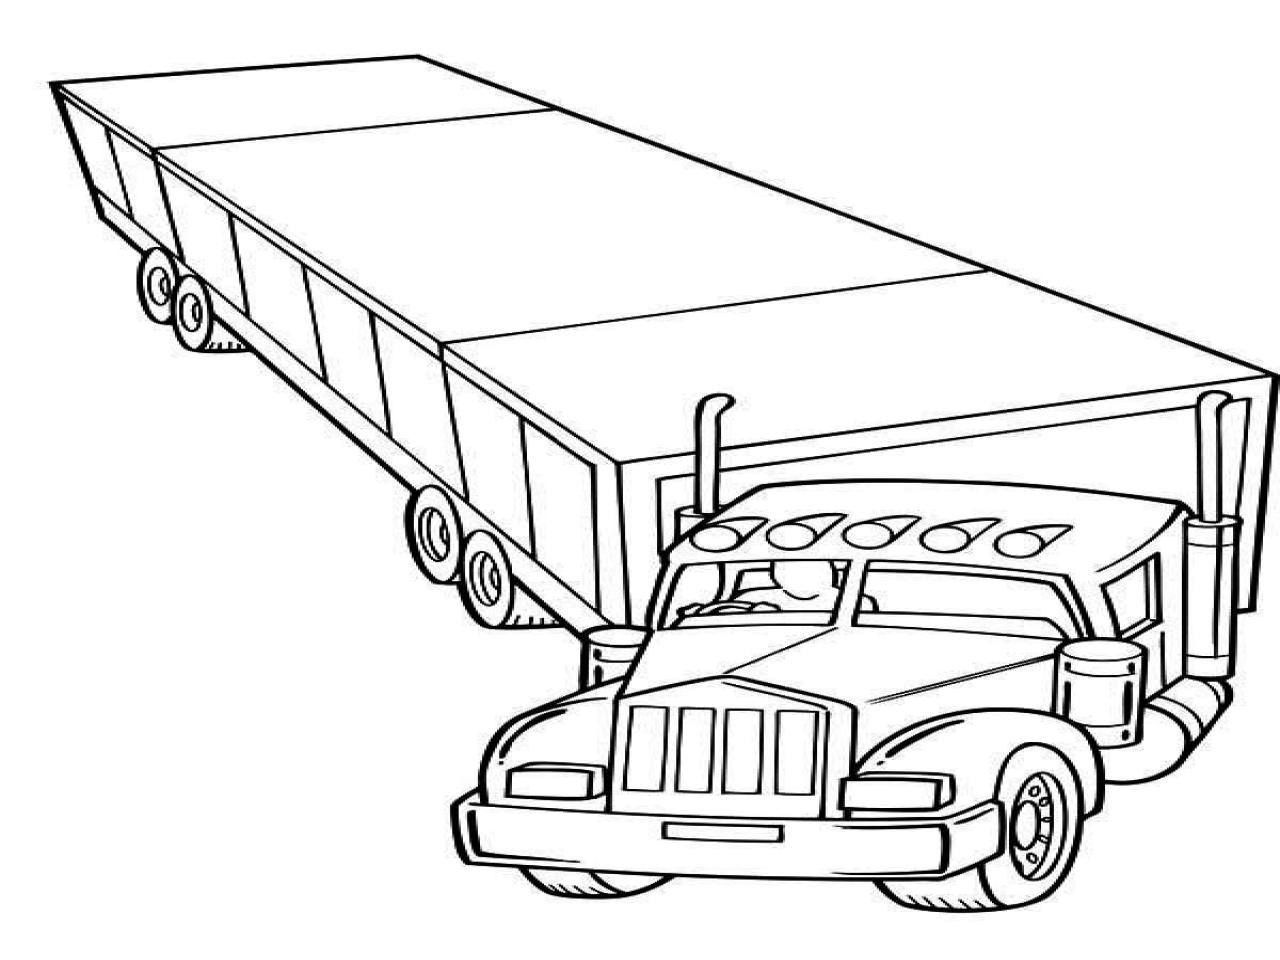 1280x960 Semi Truck Coloring Sheets Trailer Page Netart